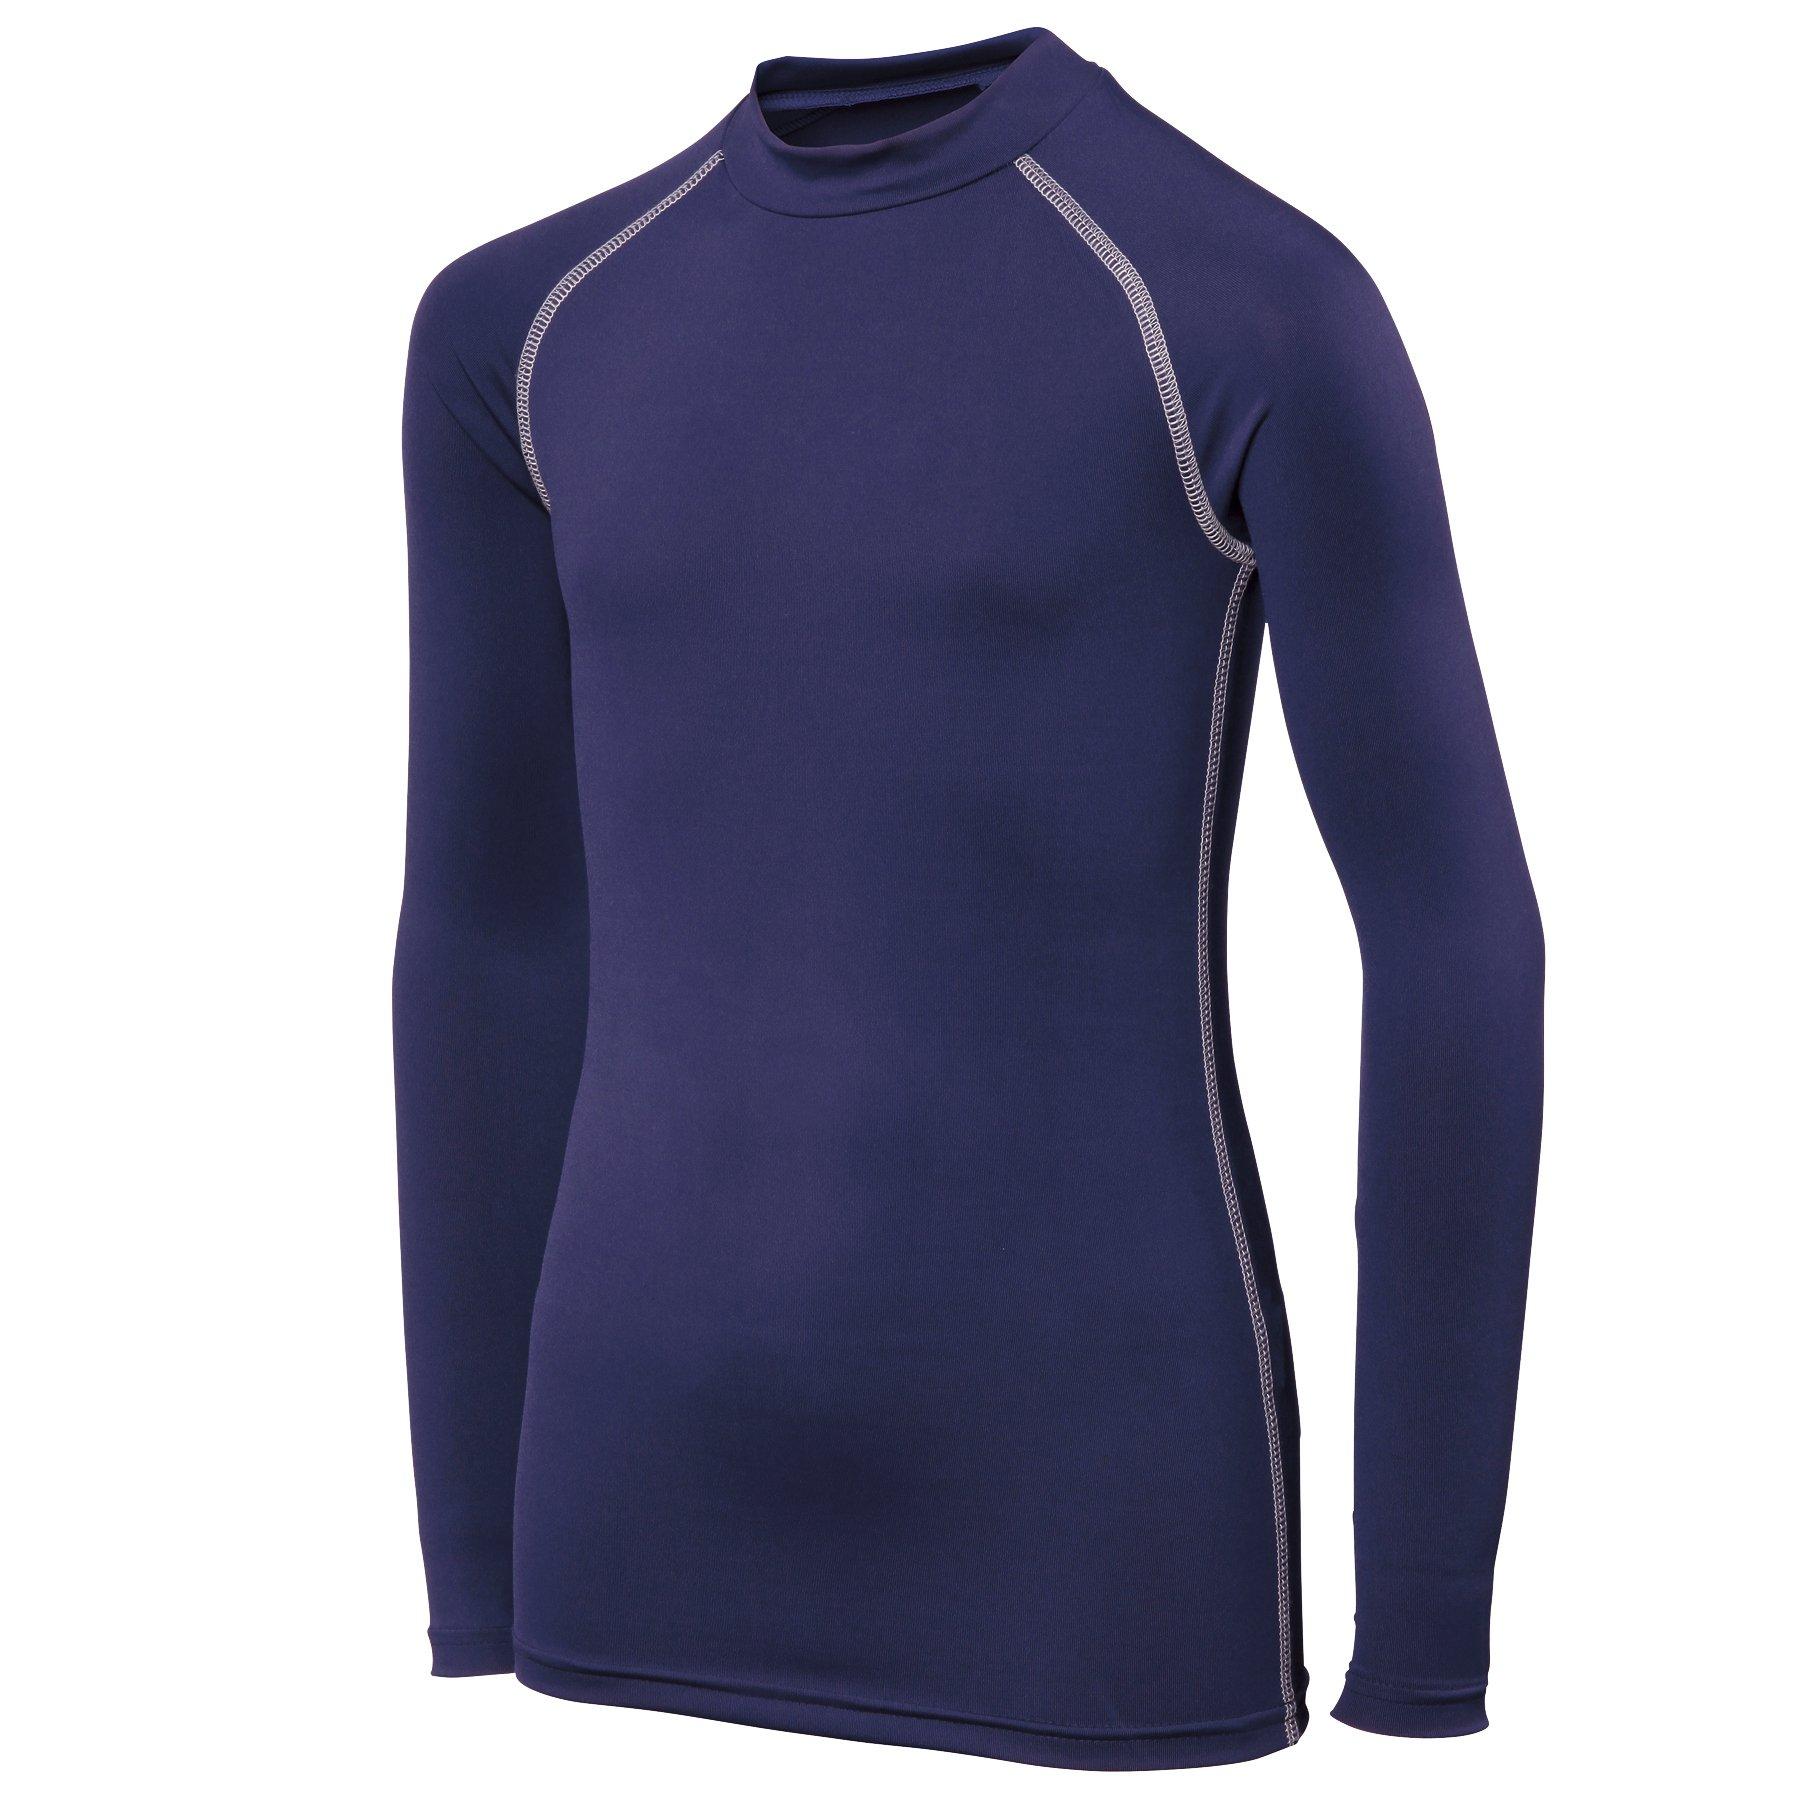 Rhino Childrens Big Boys Long Sleeve Thermal Underwear Base Layer Vest Top (LY-XLY) (Navy) by Rhino